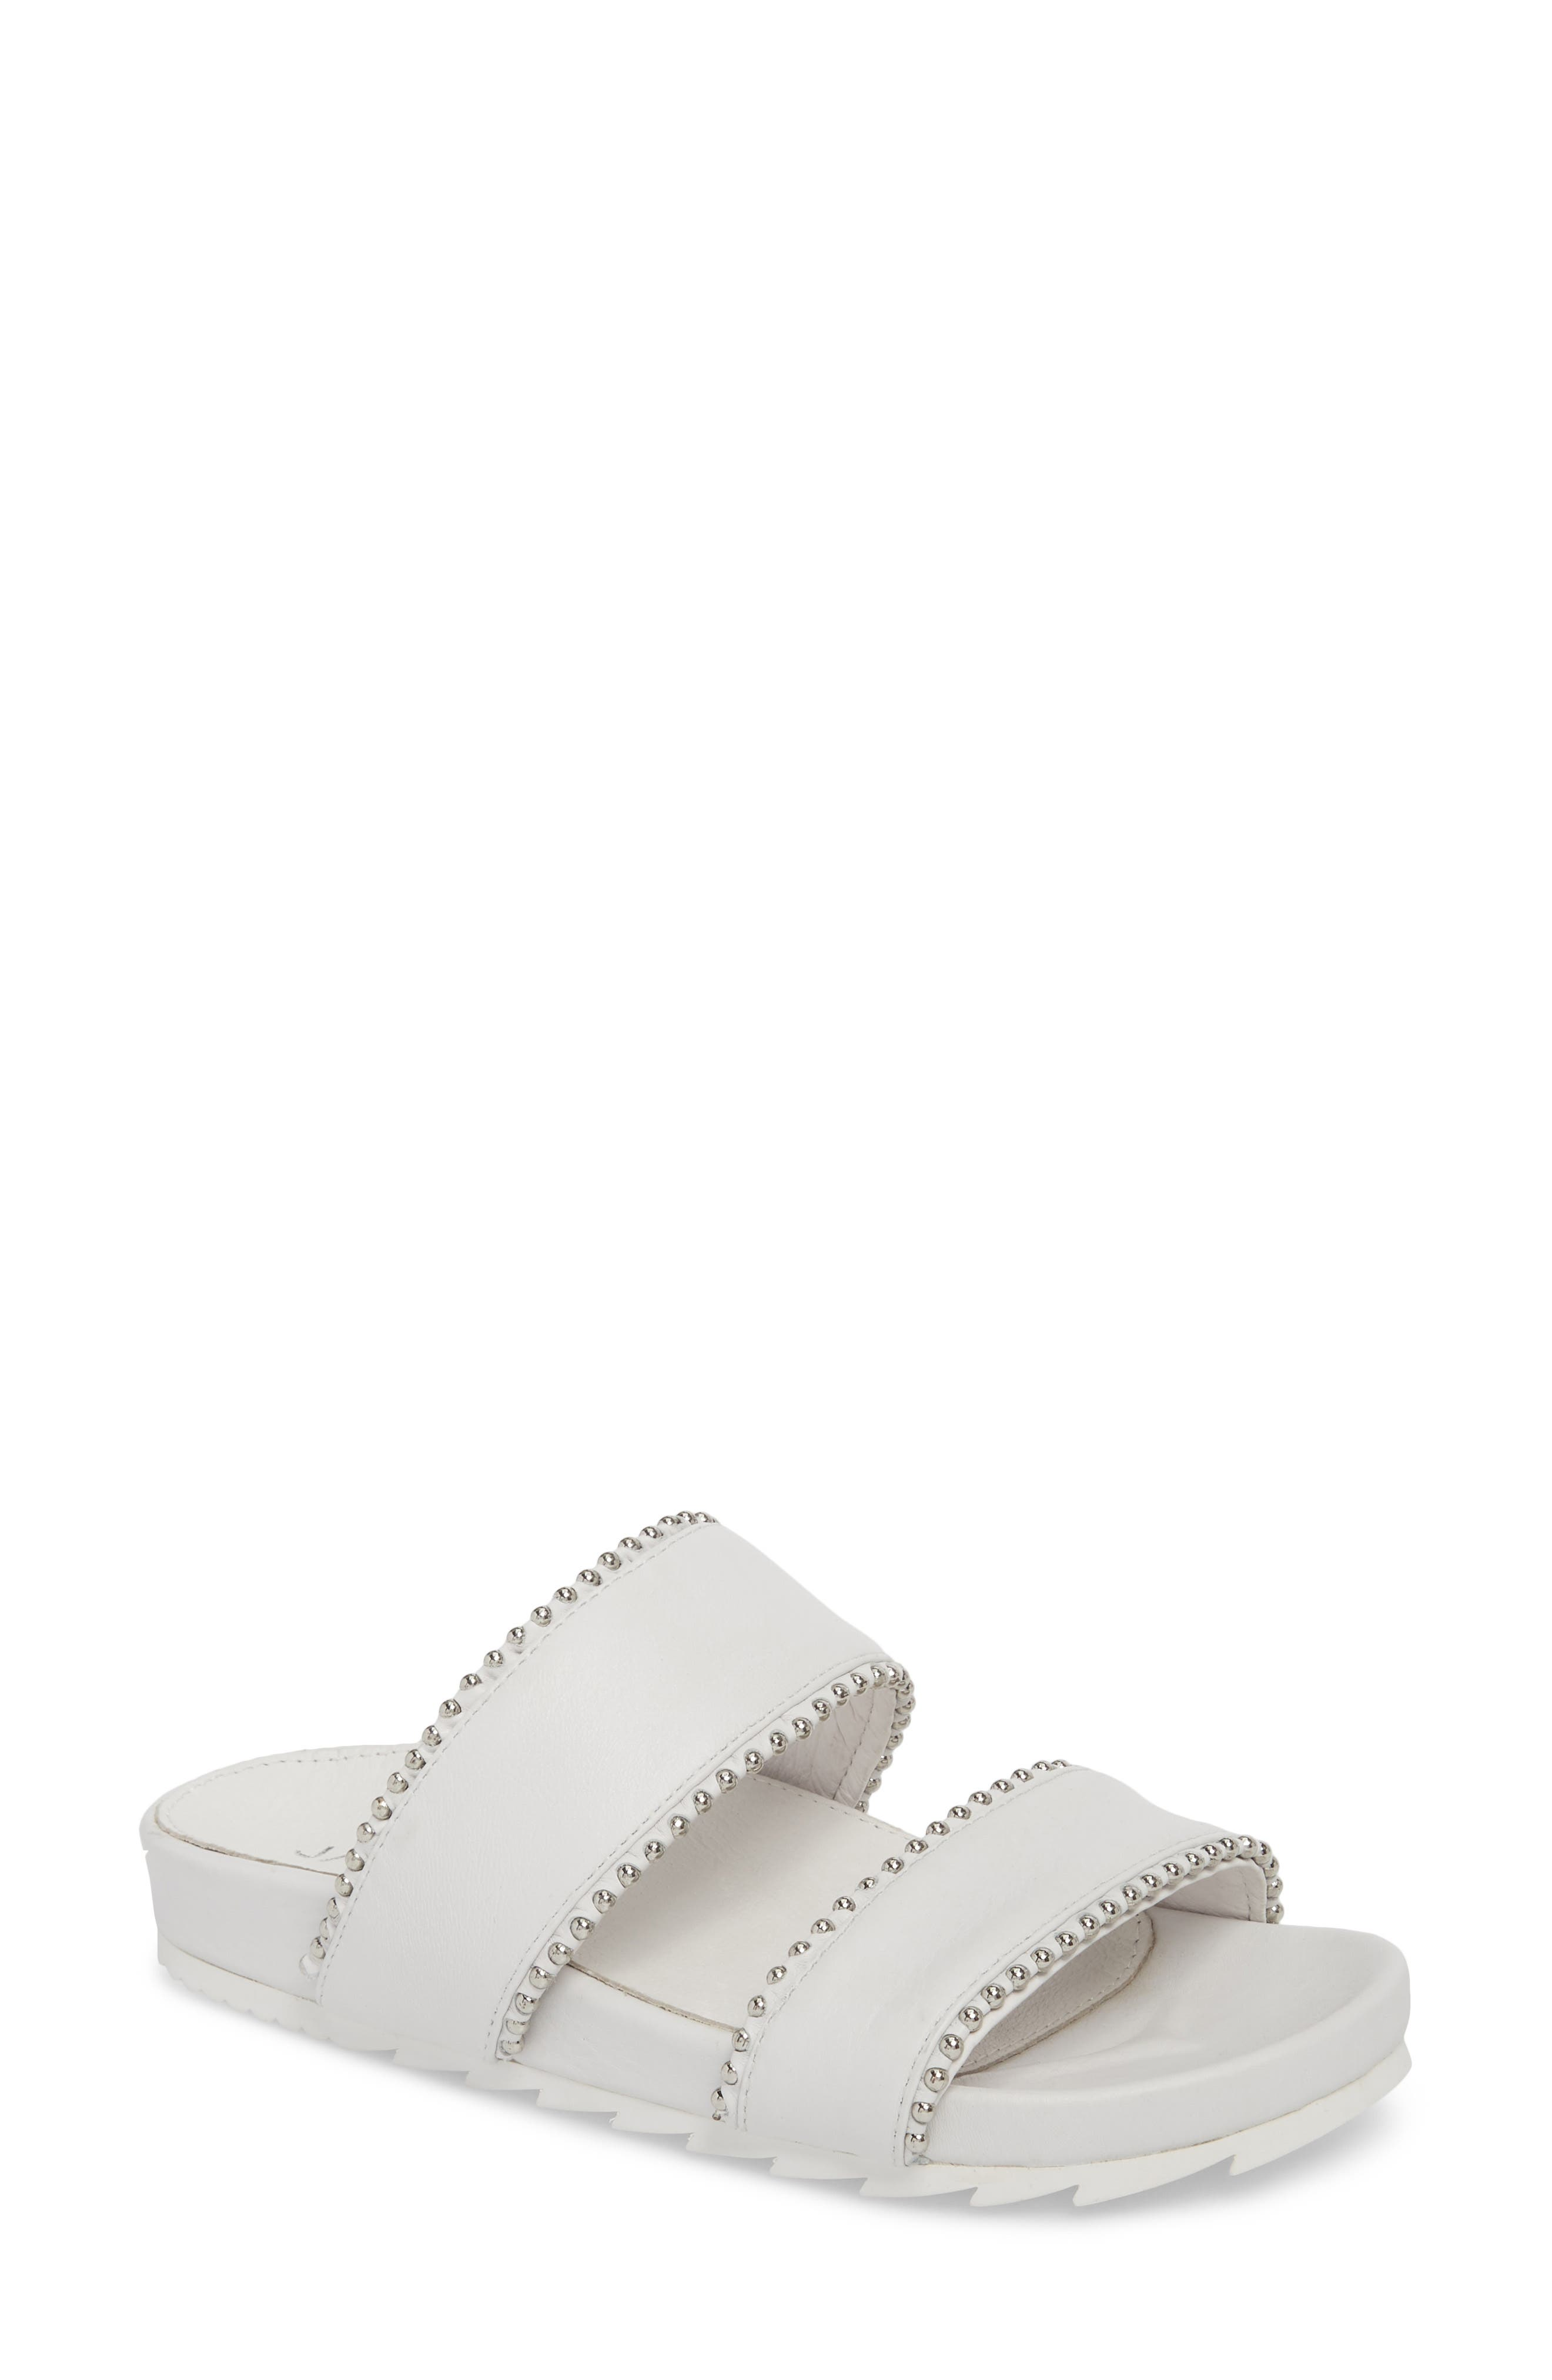 Emmie Bead Chain Slide Sandal,                             Main thumbnail 1, color,                             White Leather